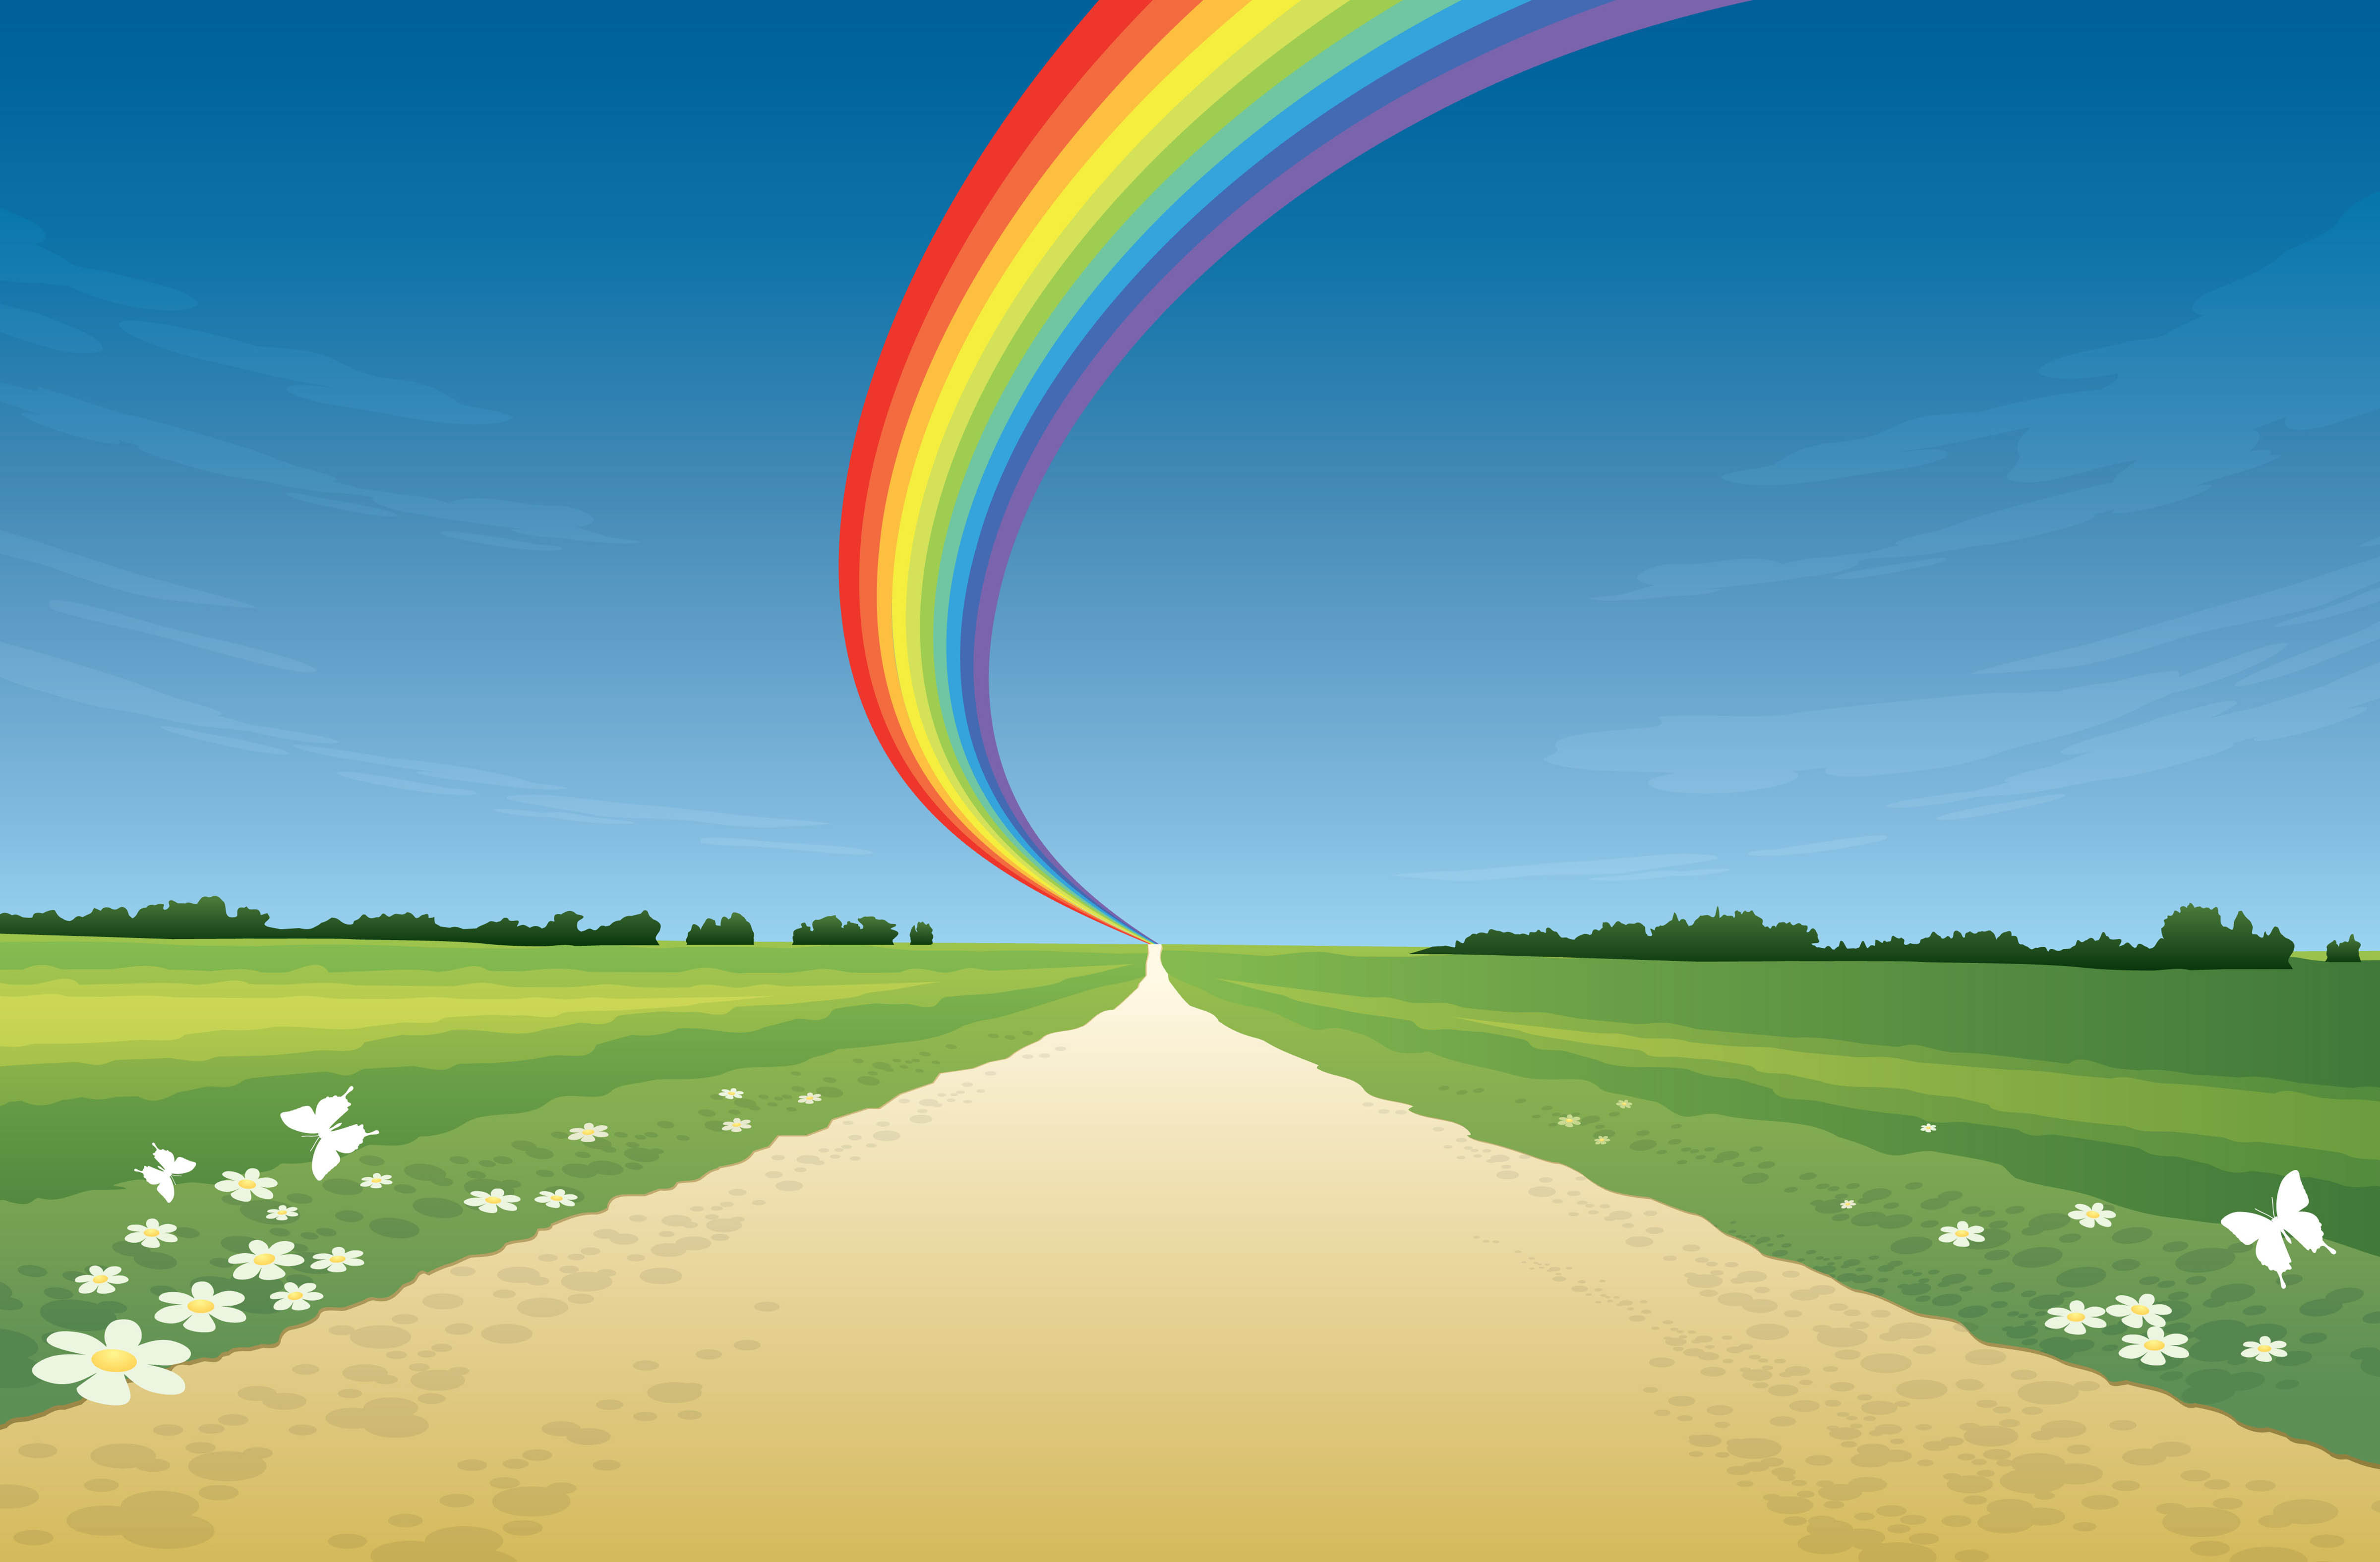 дорога, зеленая трава, радуга, синее небо, скачать фото